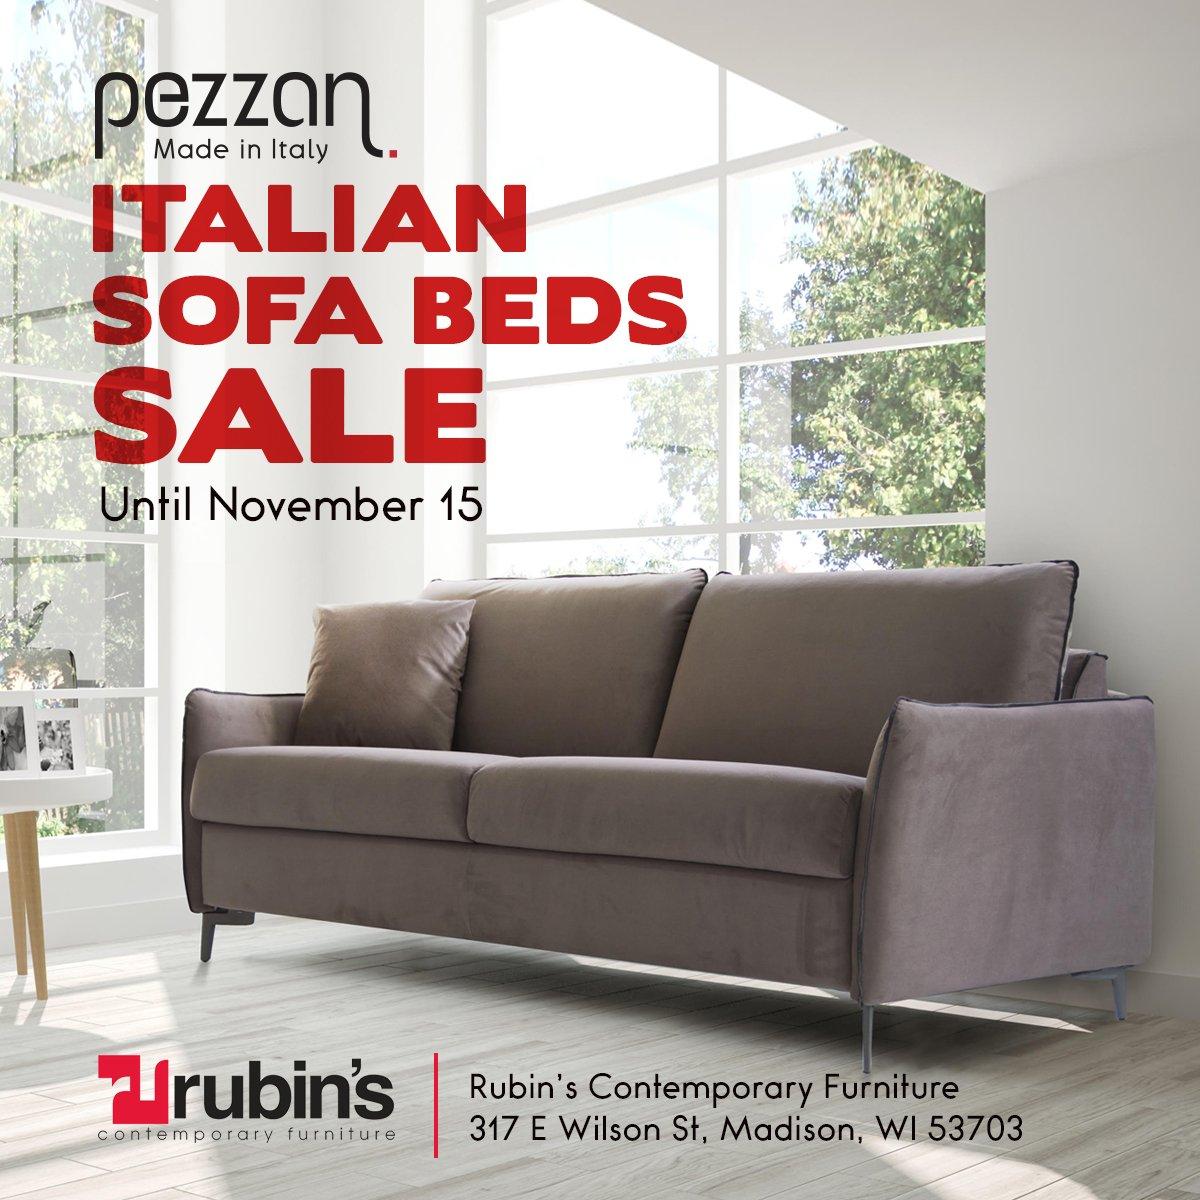 #Pezzan Sale At Rubinu0027s Furniture In Madison WI Ending Tomorrow....  #sofabed #pezzanusapic.twitter.com/jdsp5cIV2a